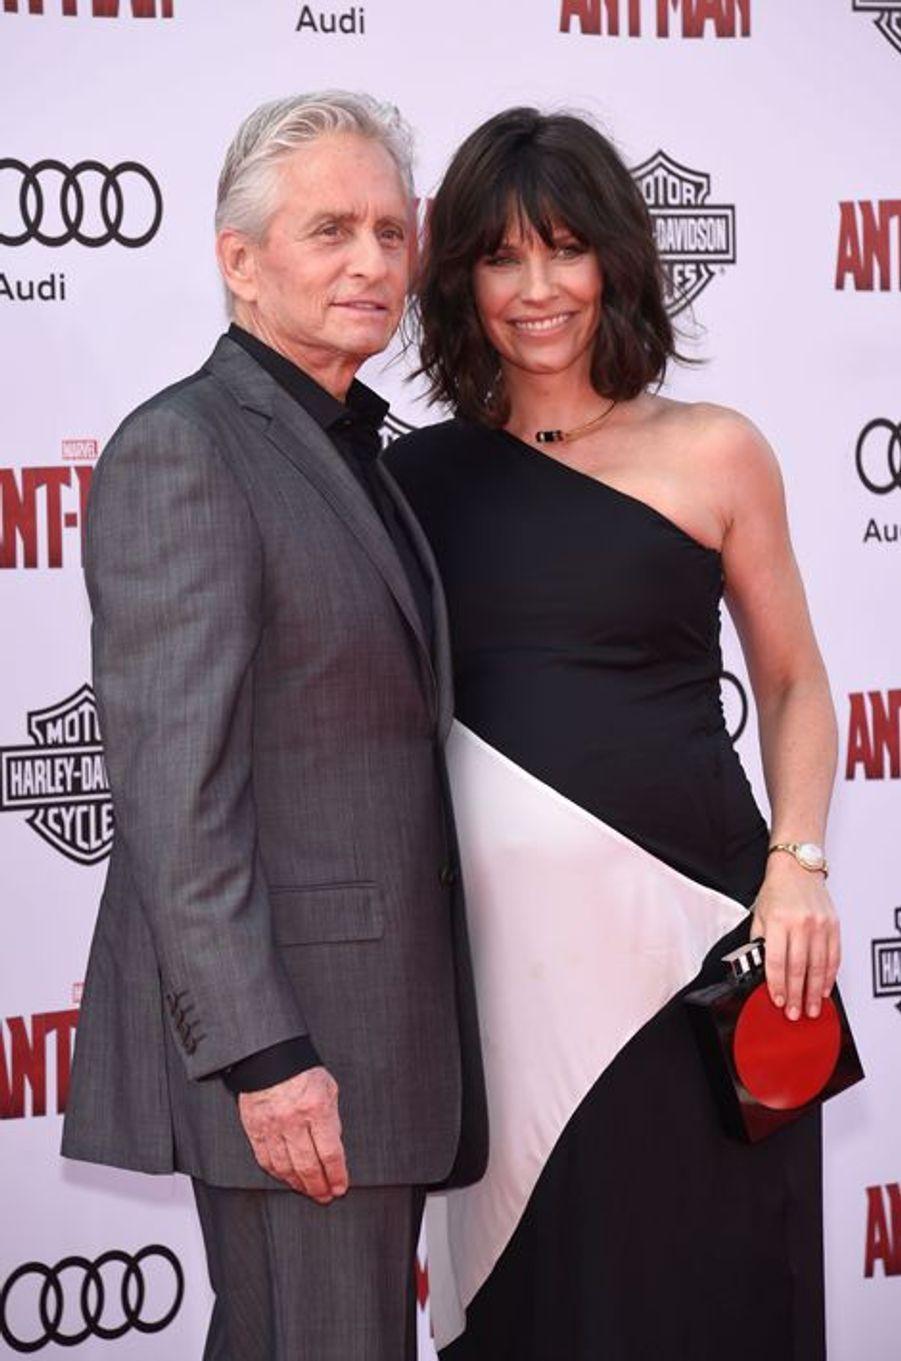 Michael Douglas et Evangeline Lilly